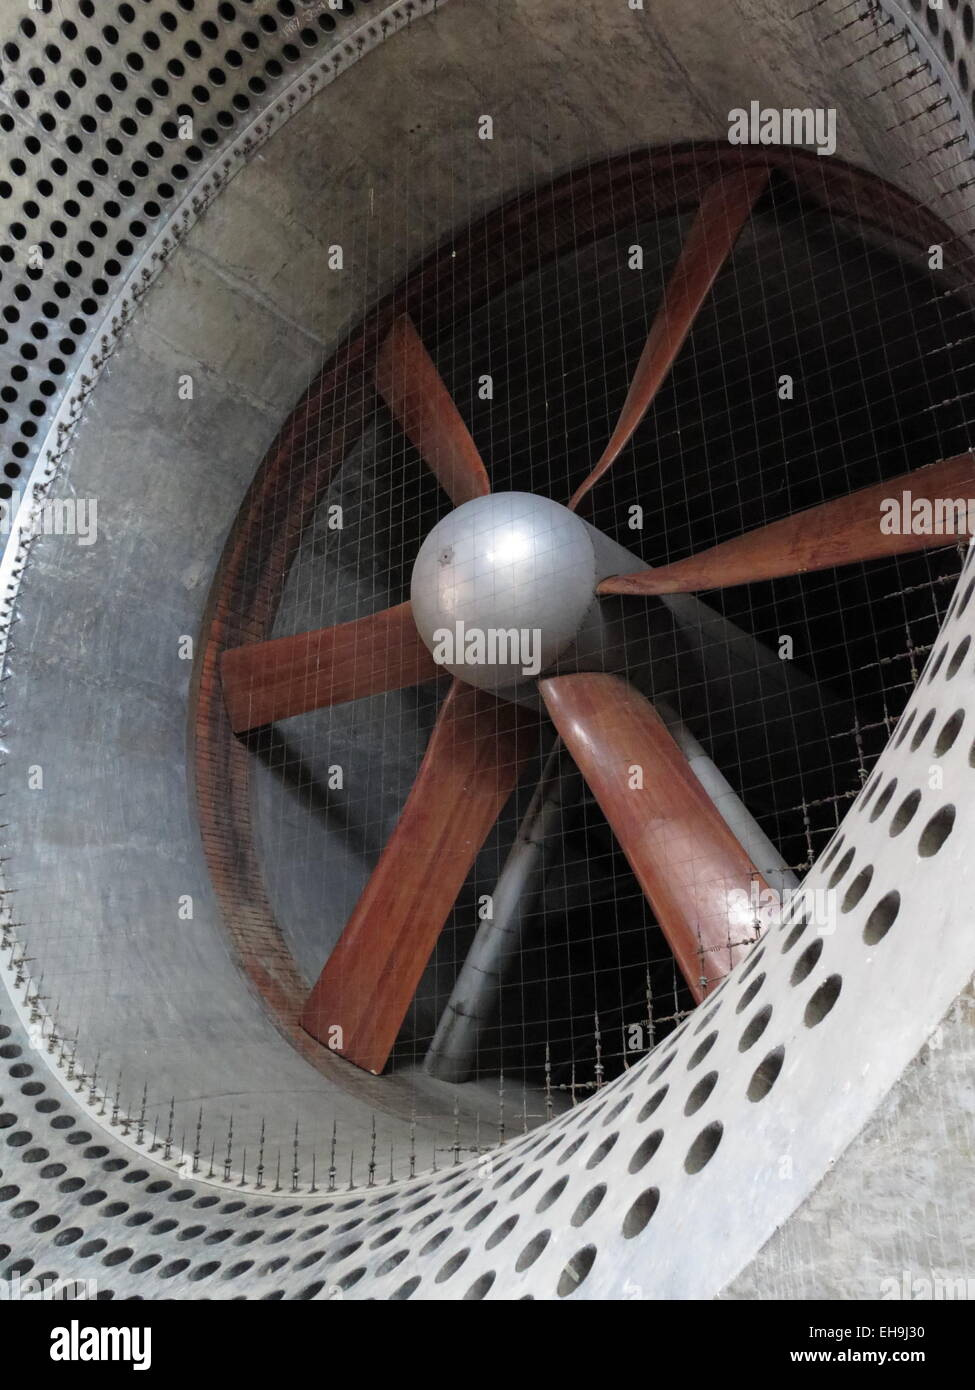 Royal Aircraft Establishment Farnborough: 24ft low-sped wind tunnel - Stock Image